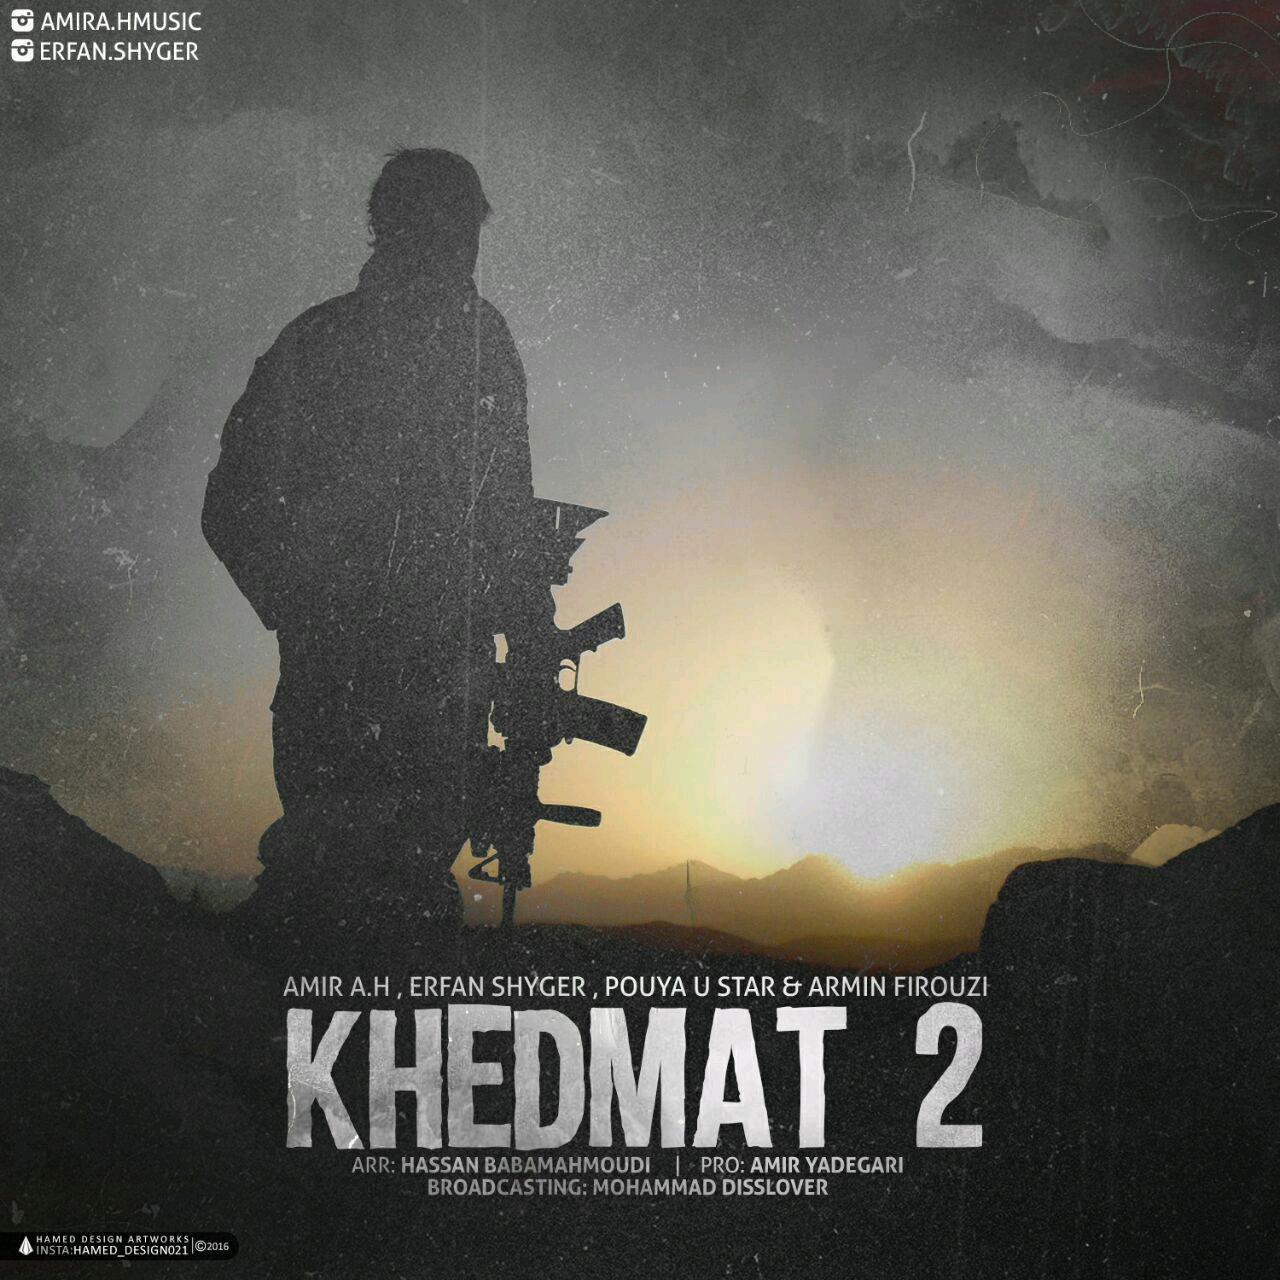 Amir A.H – Khedmat 2 (Ft Erfan Shayger & Puya Ustar And Armin Firouzi)